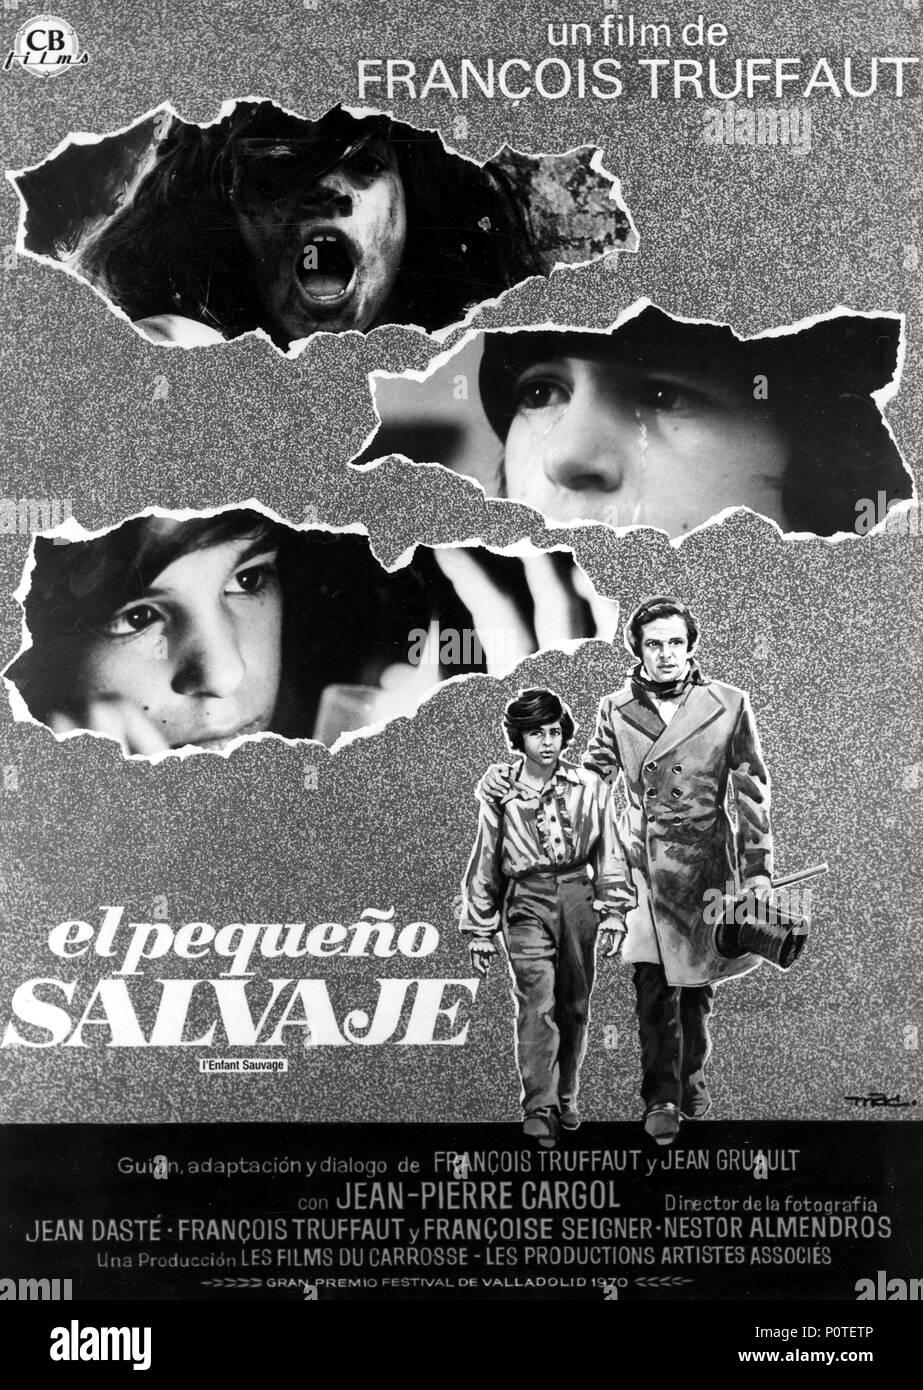 Original Film Title: L' ENFANT SAUVAGE.  English Title: WILD CHILD, THE.  Film Director: FRANCOIS TRUFFAUT.  Year: 1970. Credit: FILMS DU CAROSSE/ARTISTES ASSOCIES / Album - Stock Image